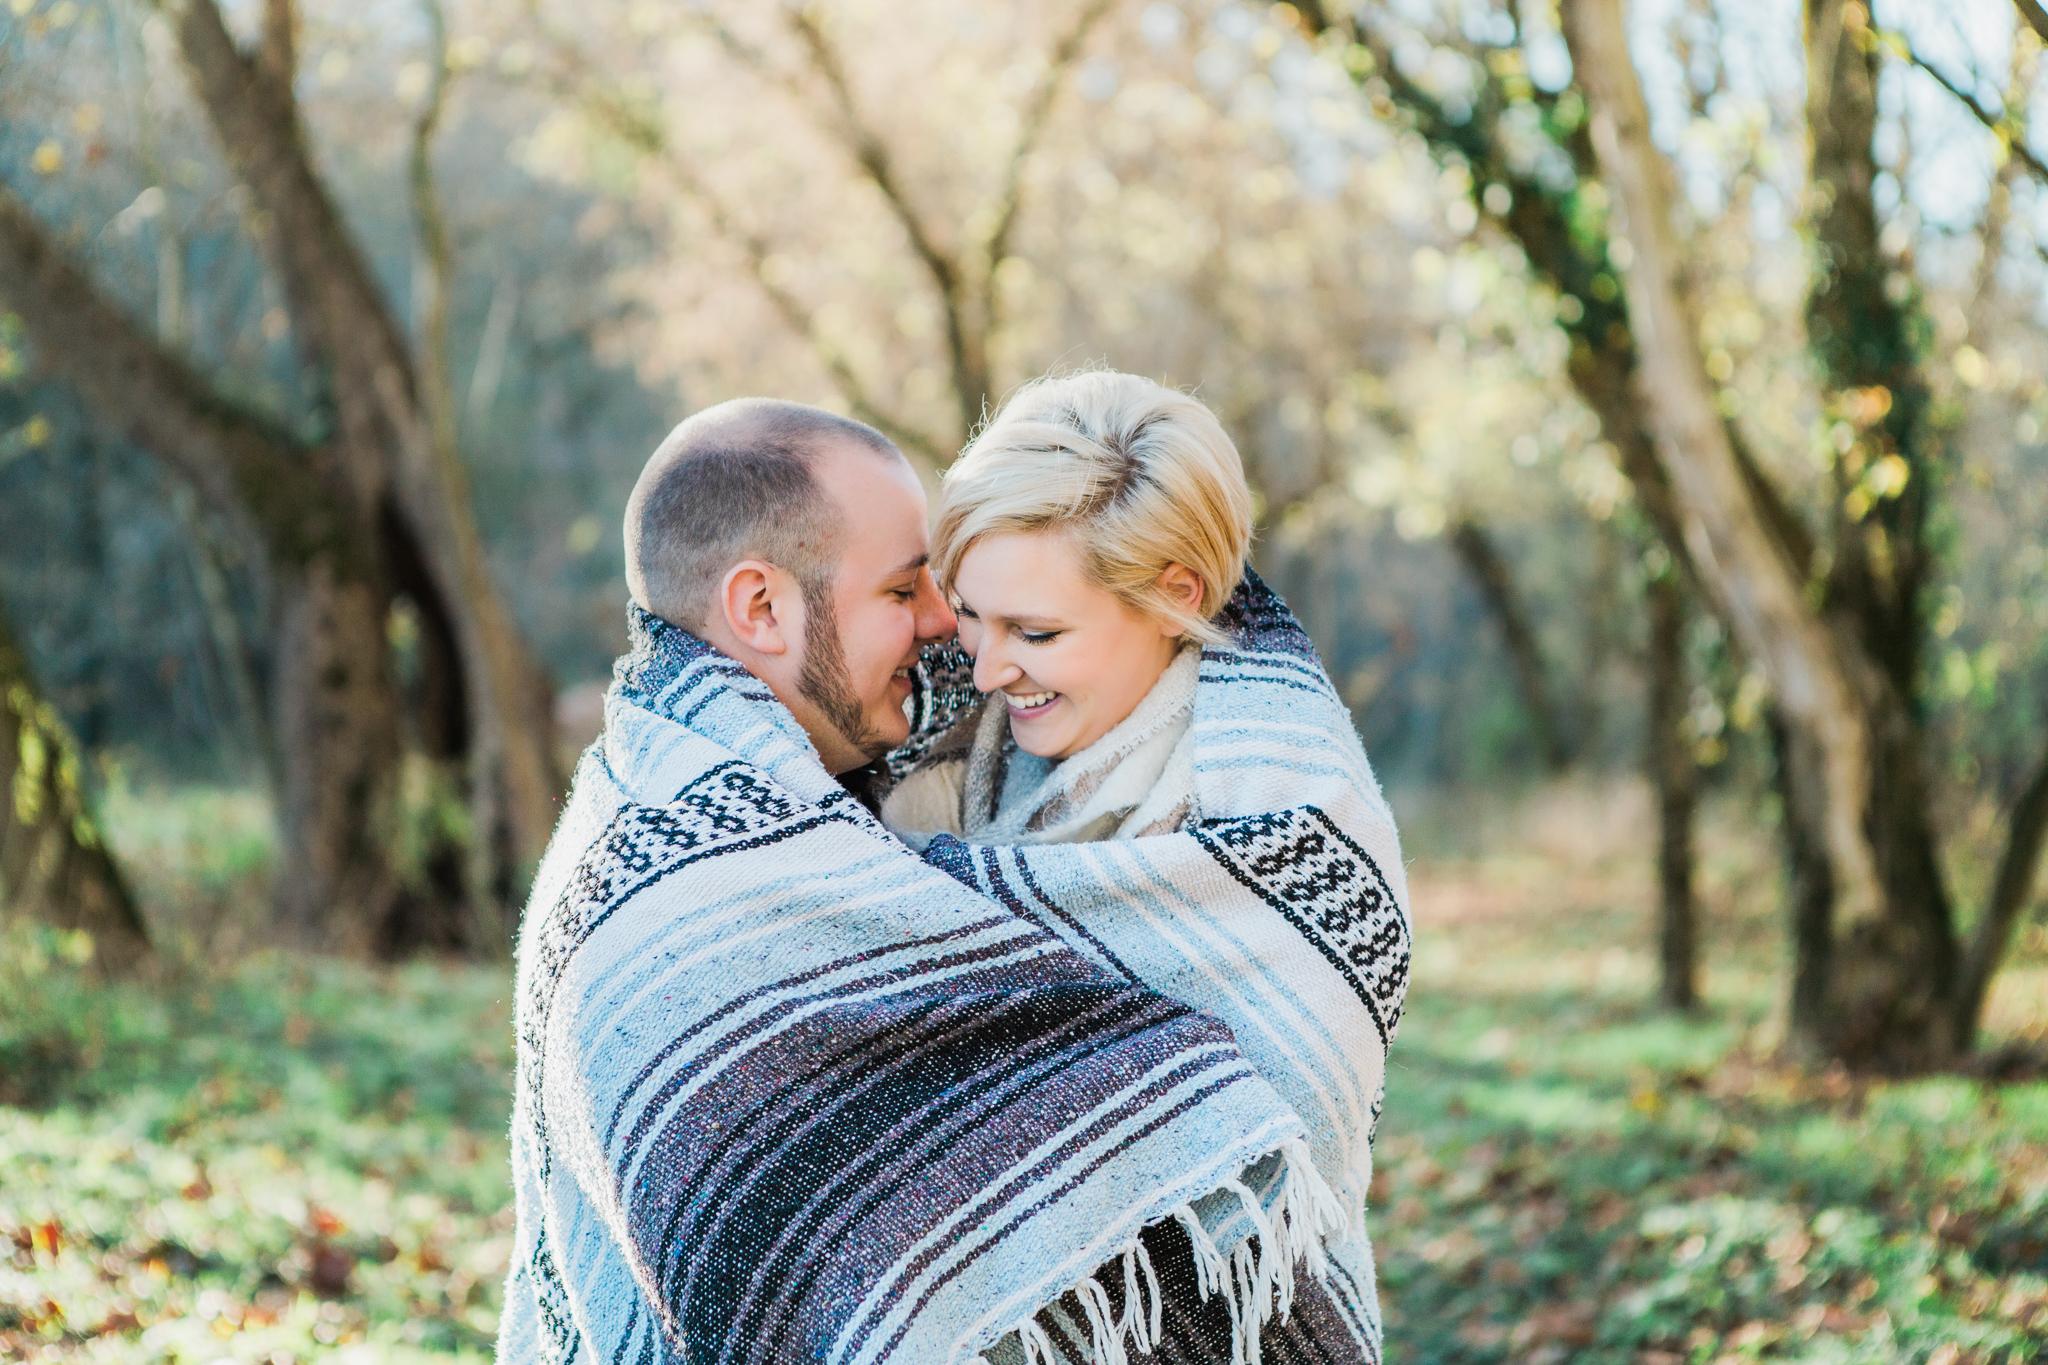 Richmond Kentucky Engagement Photographer - Ariana Jordan Photography -20.jpg